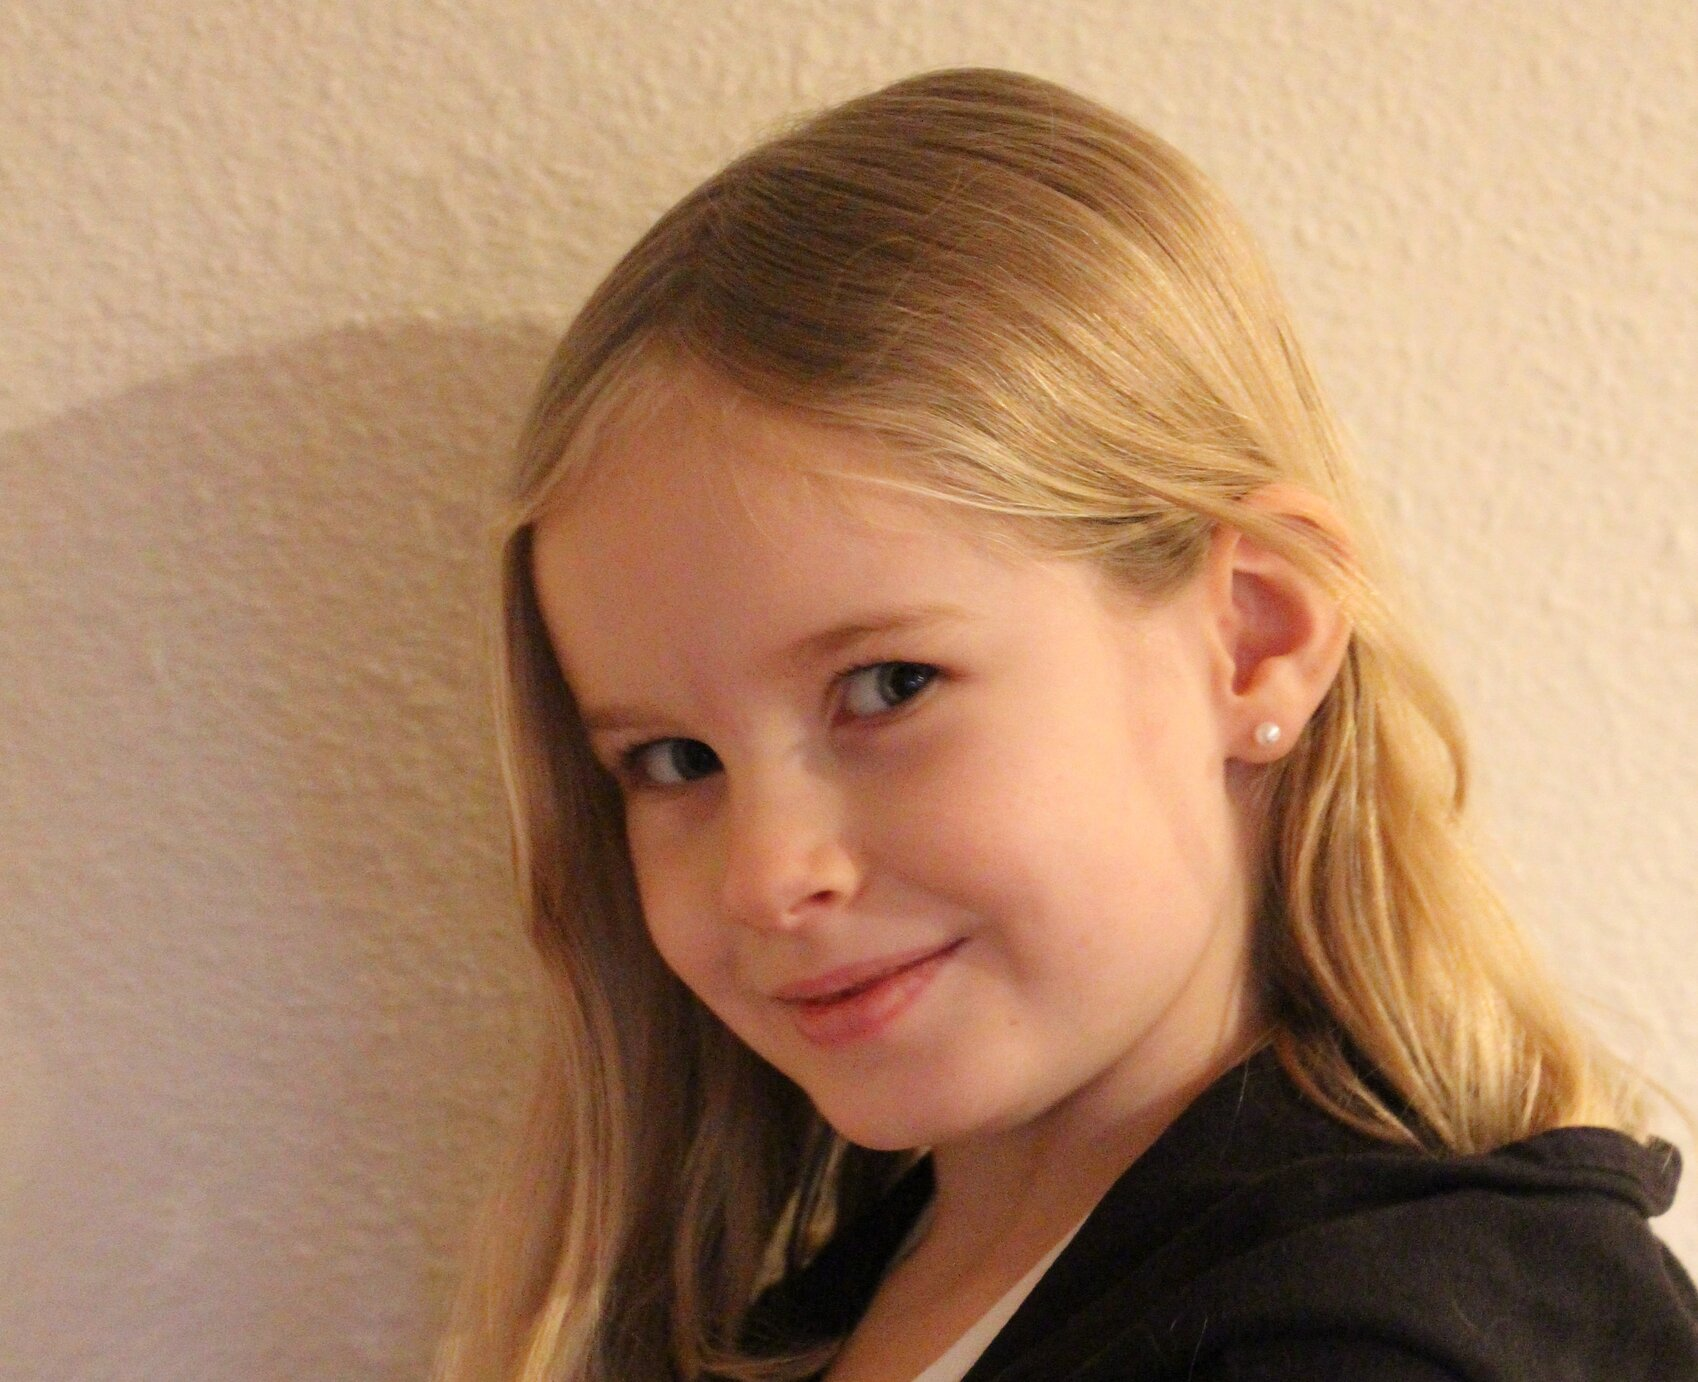 INTERVIEW WITH ACTRESS JOSEFINE HALLIN